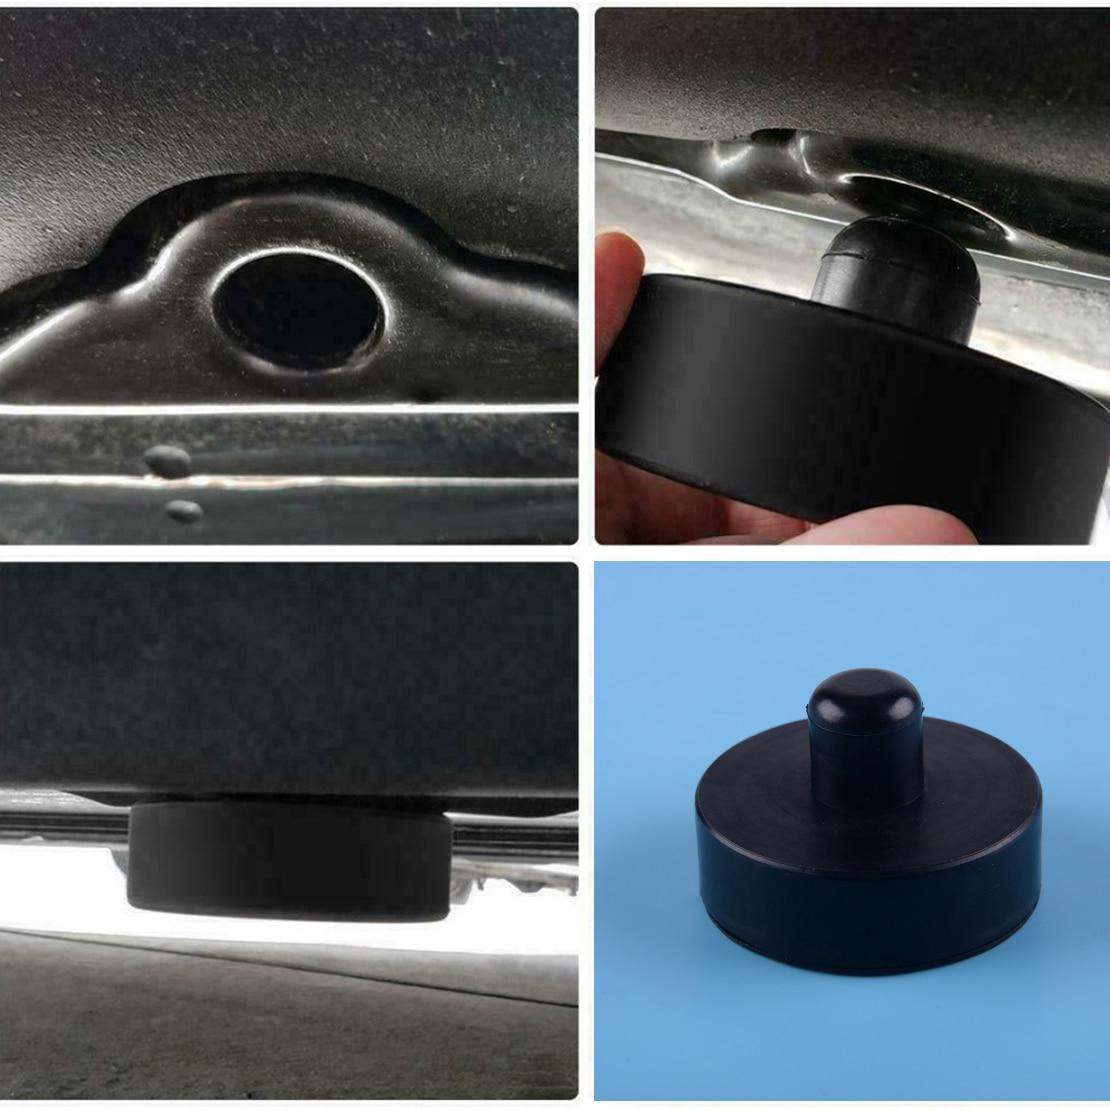 Beler Rubber Car Jack Lift Point Pad Adapter Safe Raise Tool Fit For Tesla Model 3 /S /X